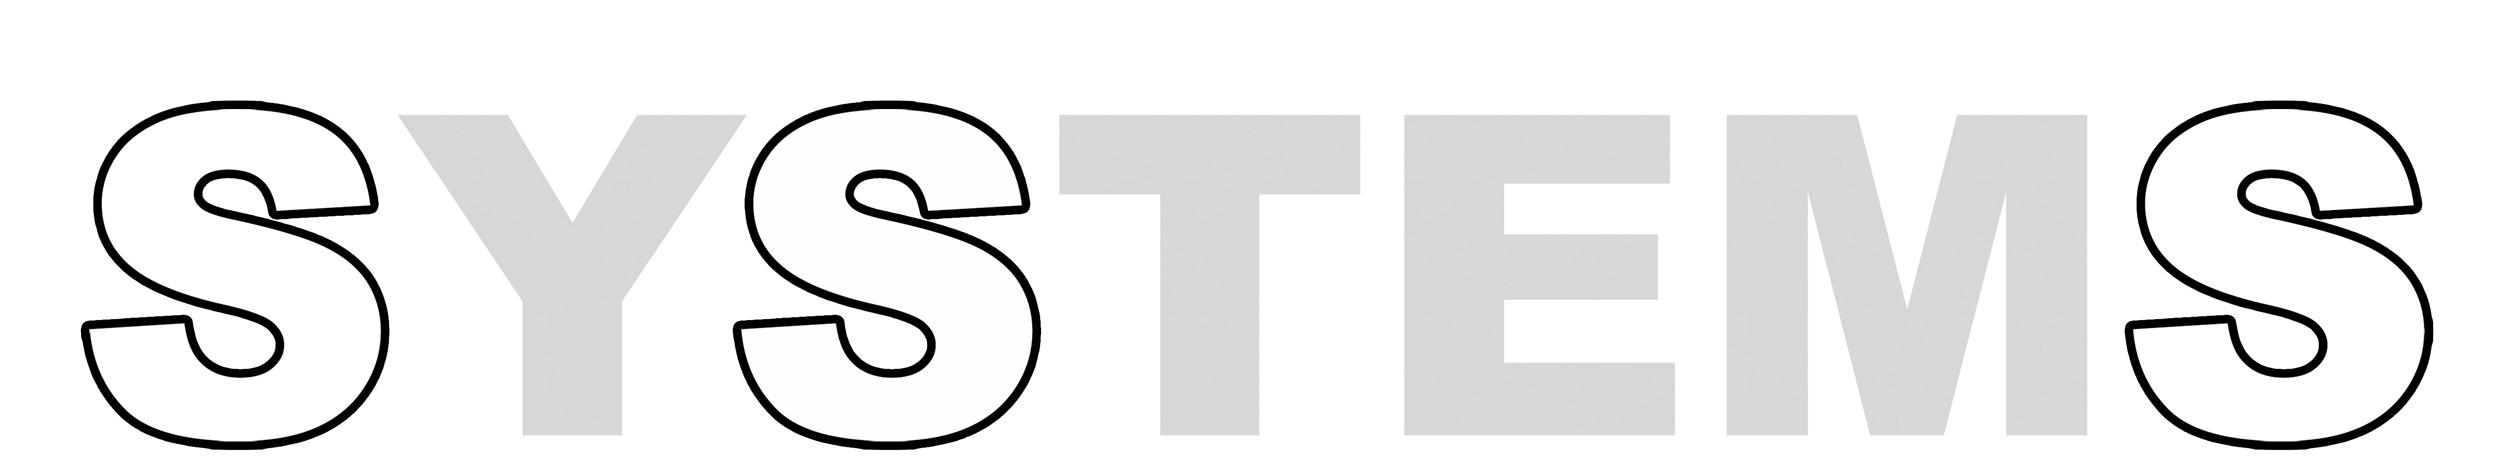 SYSTEMS_logo.jpg